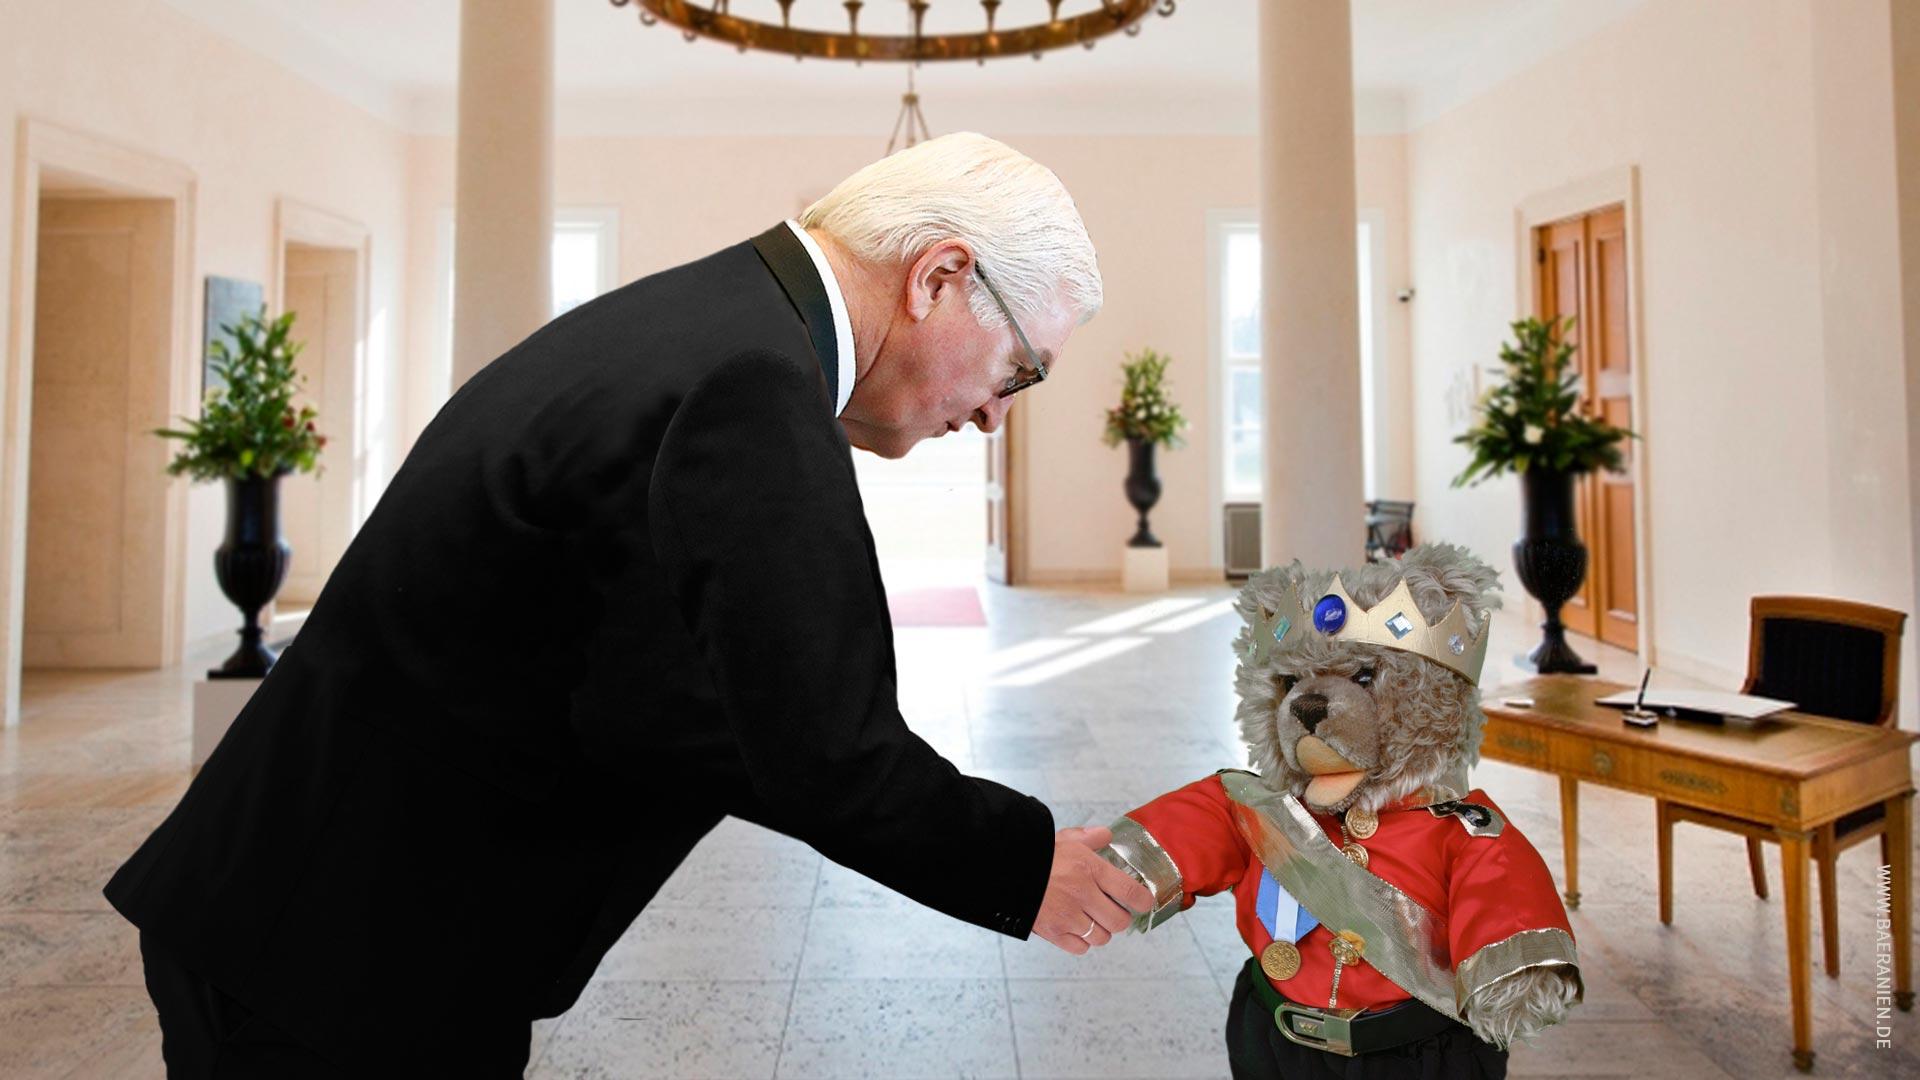 Teddybär-König Opa gratuliert Deutschland